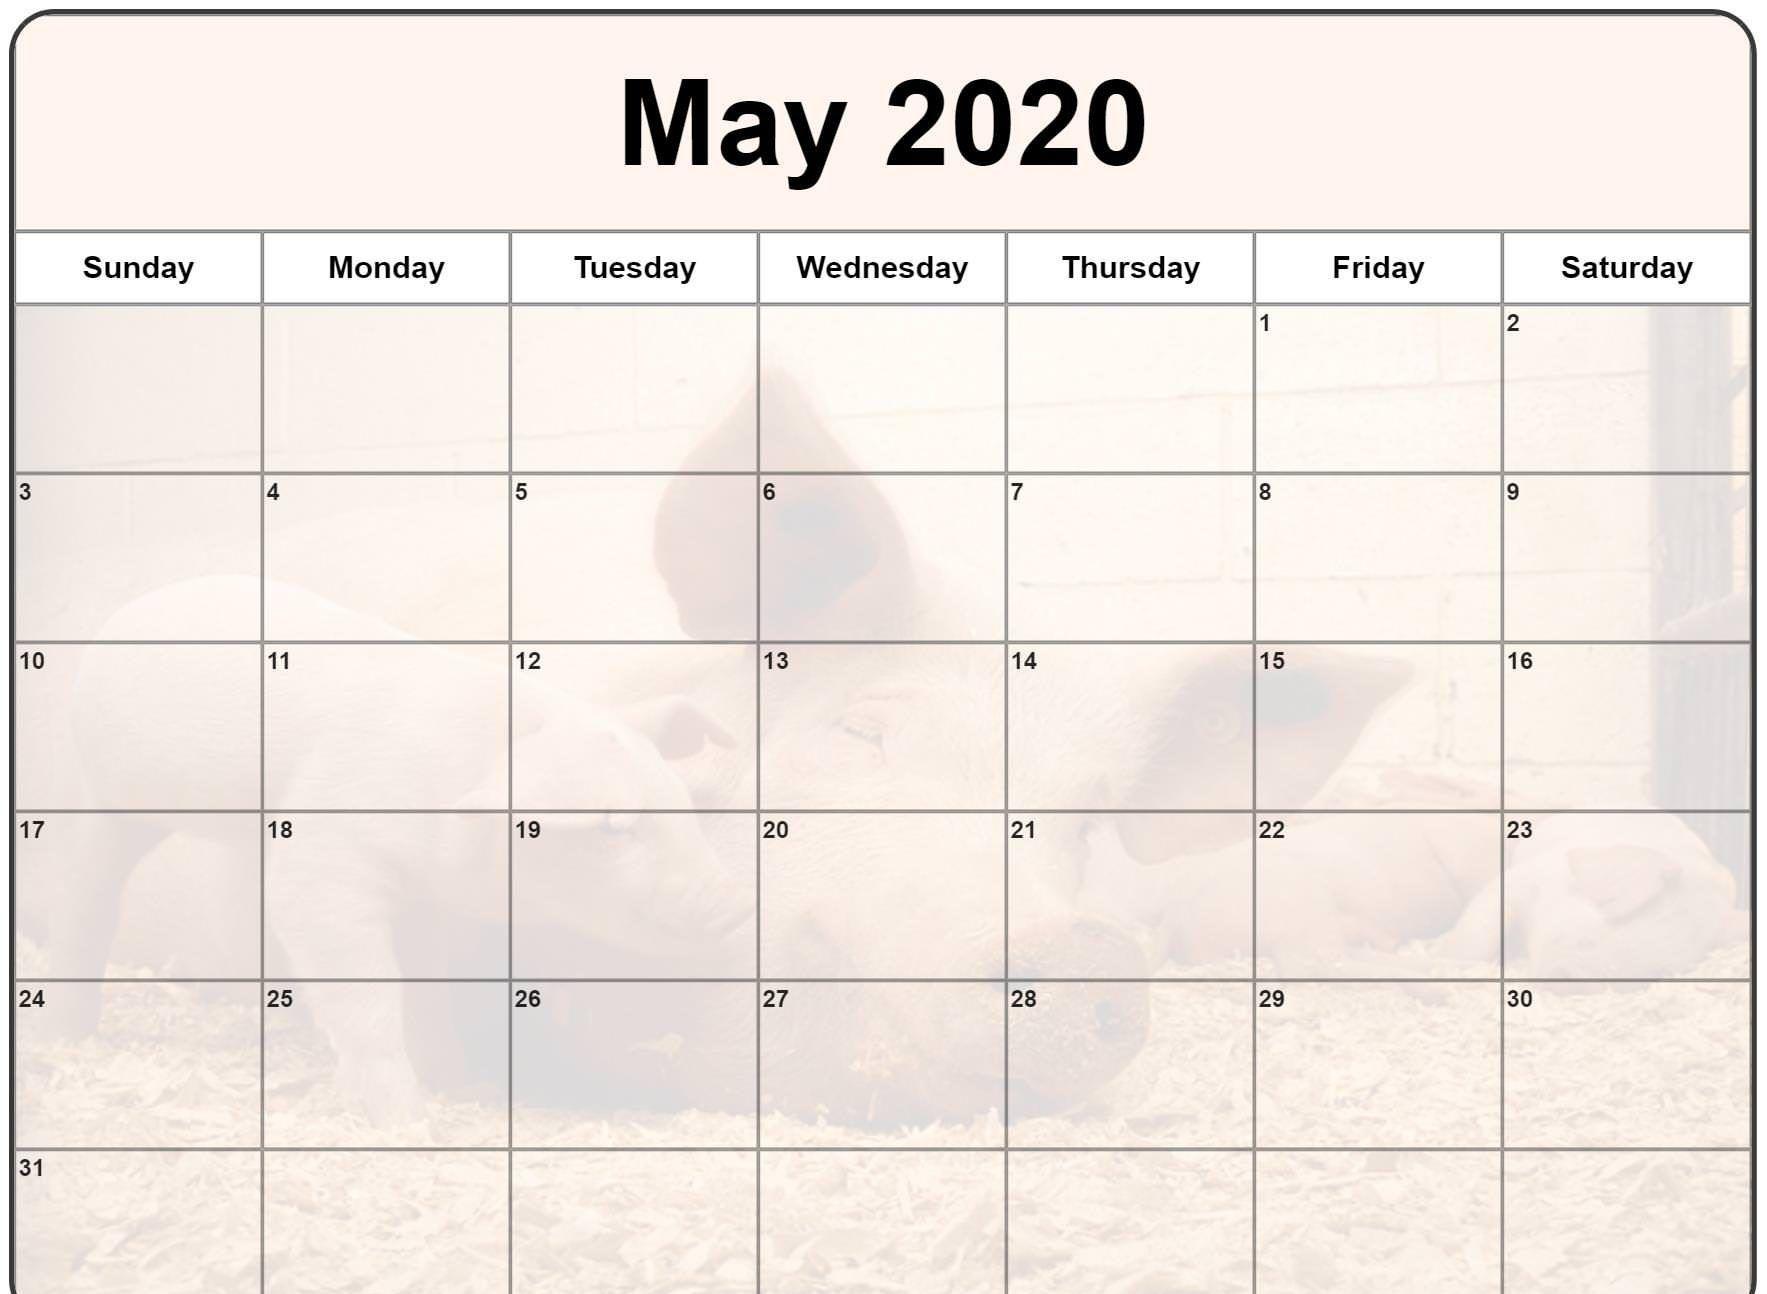 May 2020 Calendar With Holidays | Best Calendar Template